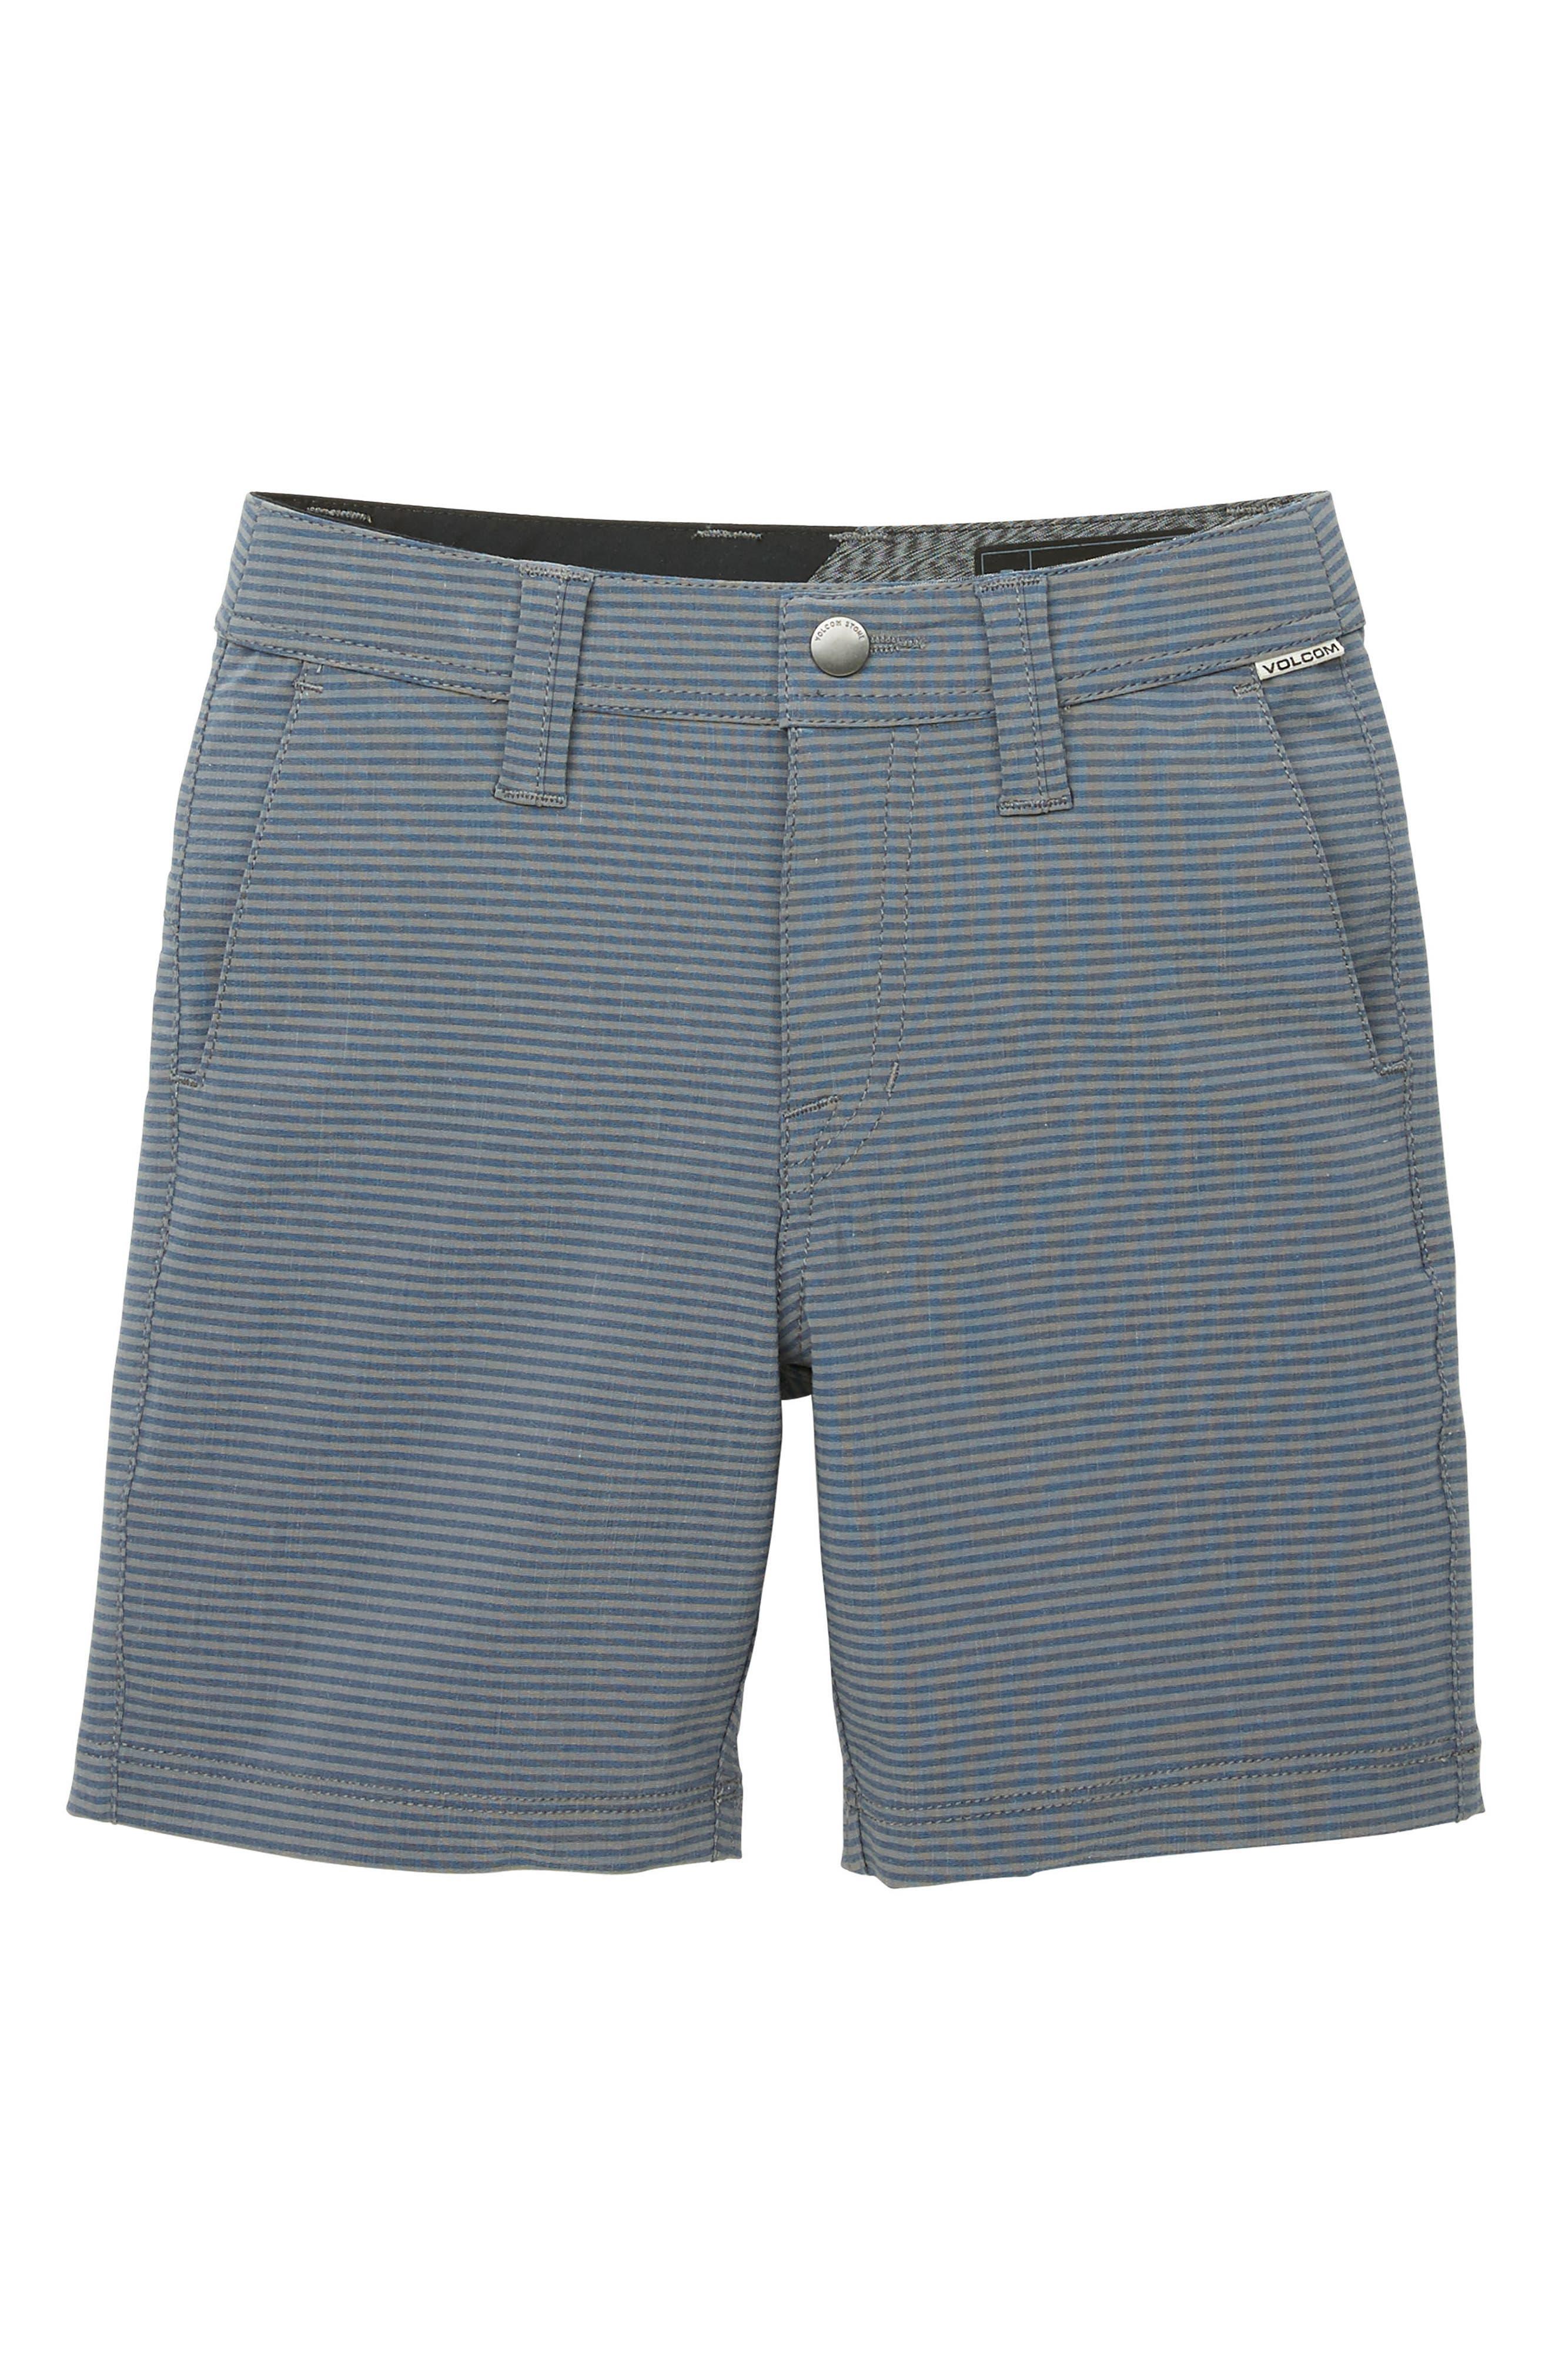 Volcom Frickin Surf N' Turf Mix Hybrid Shorts (Toddler Boys & Little Boys)